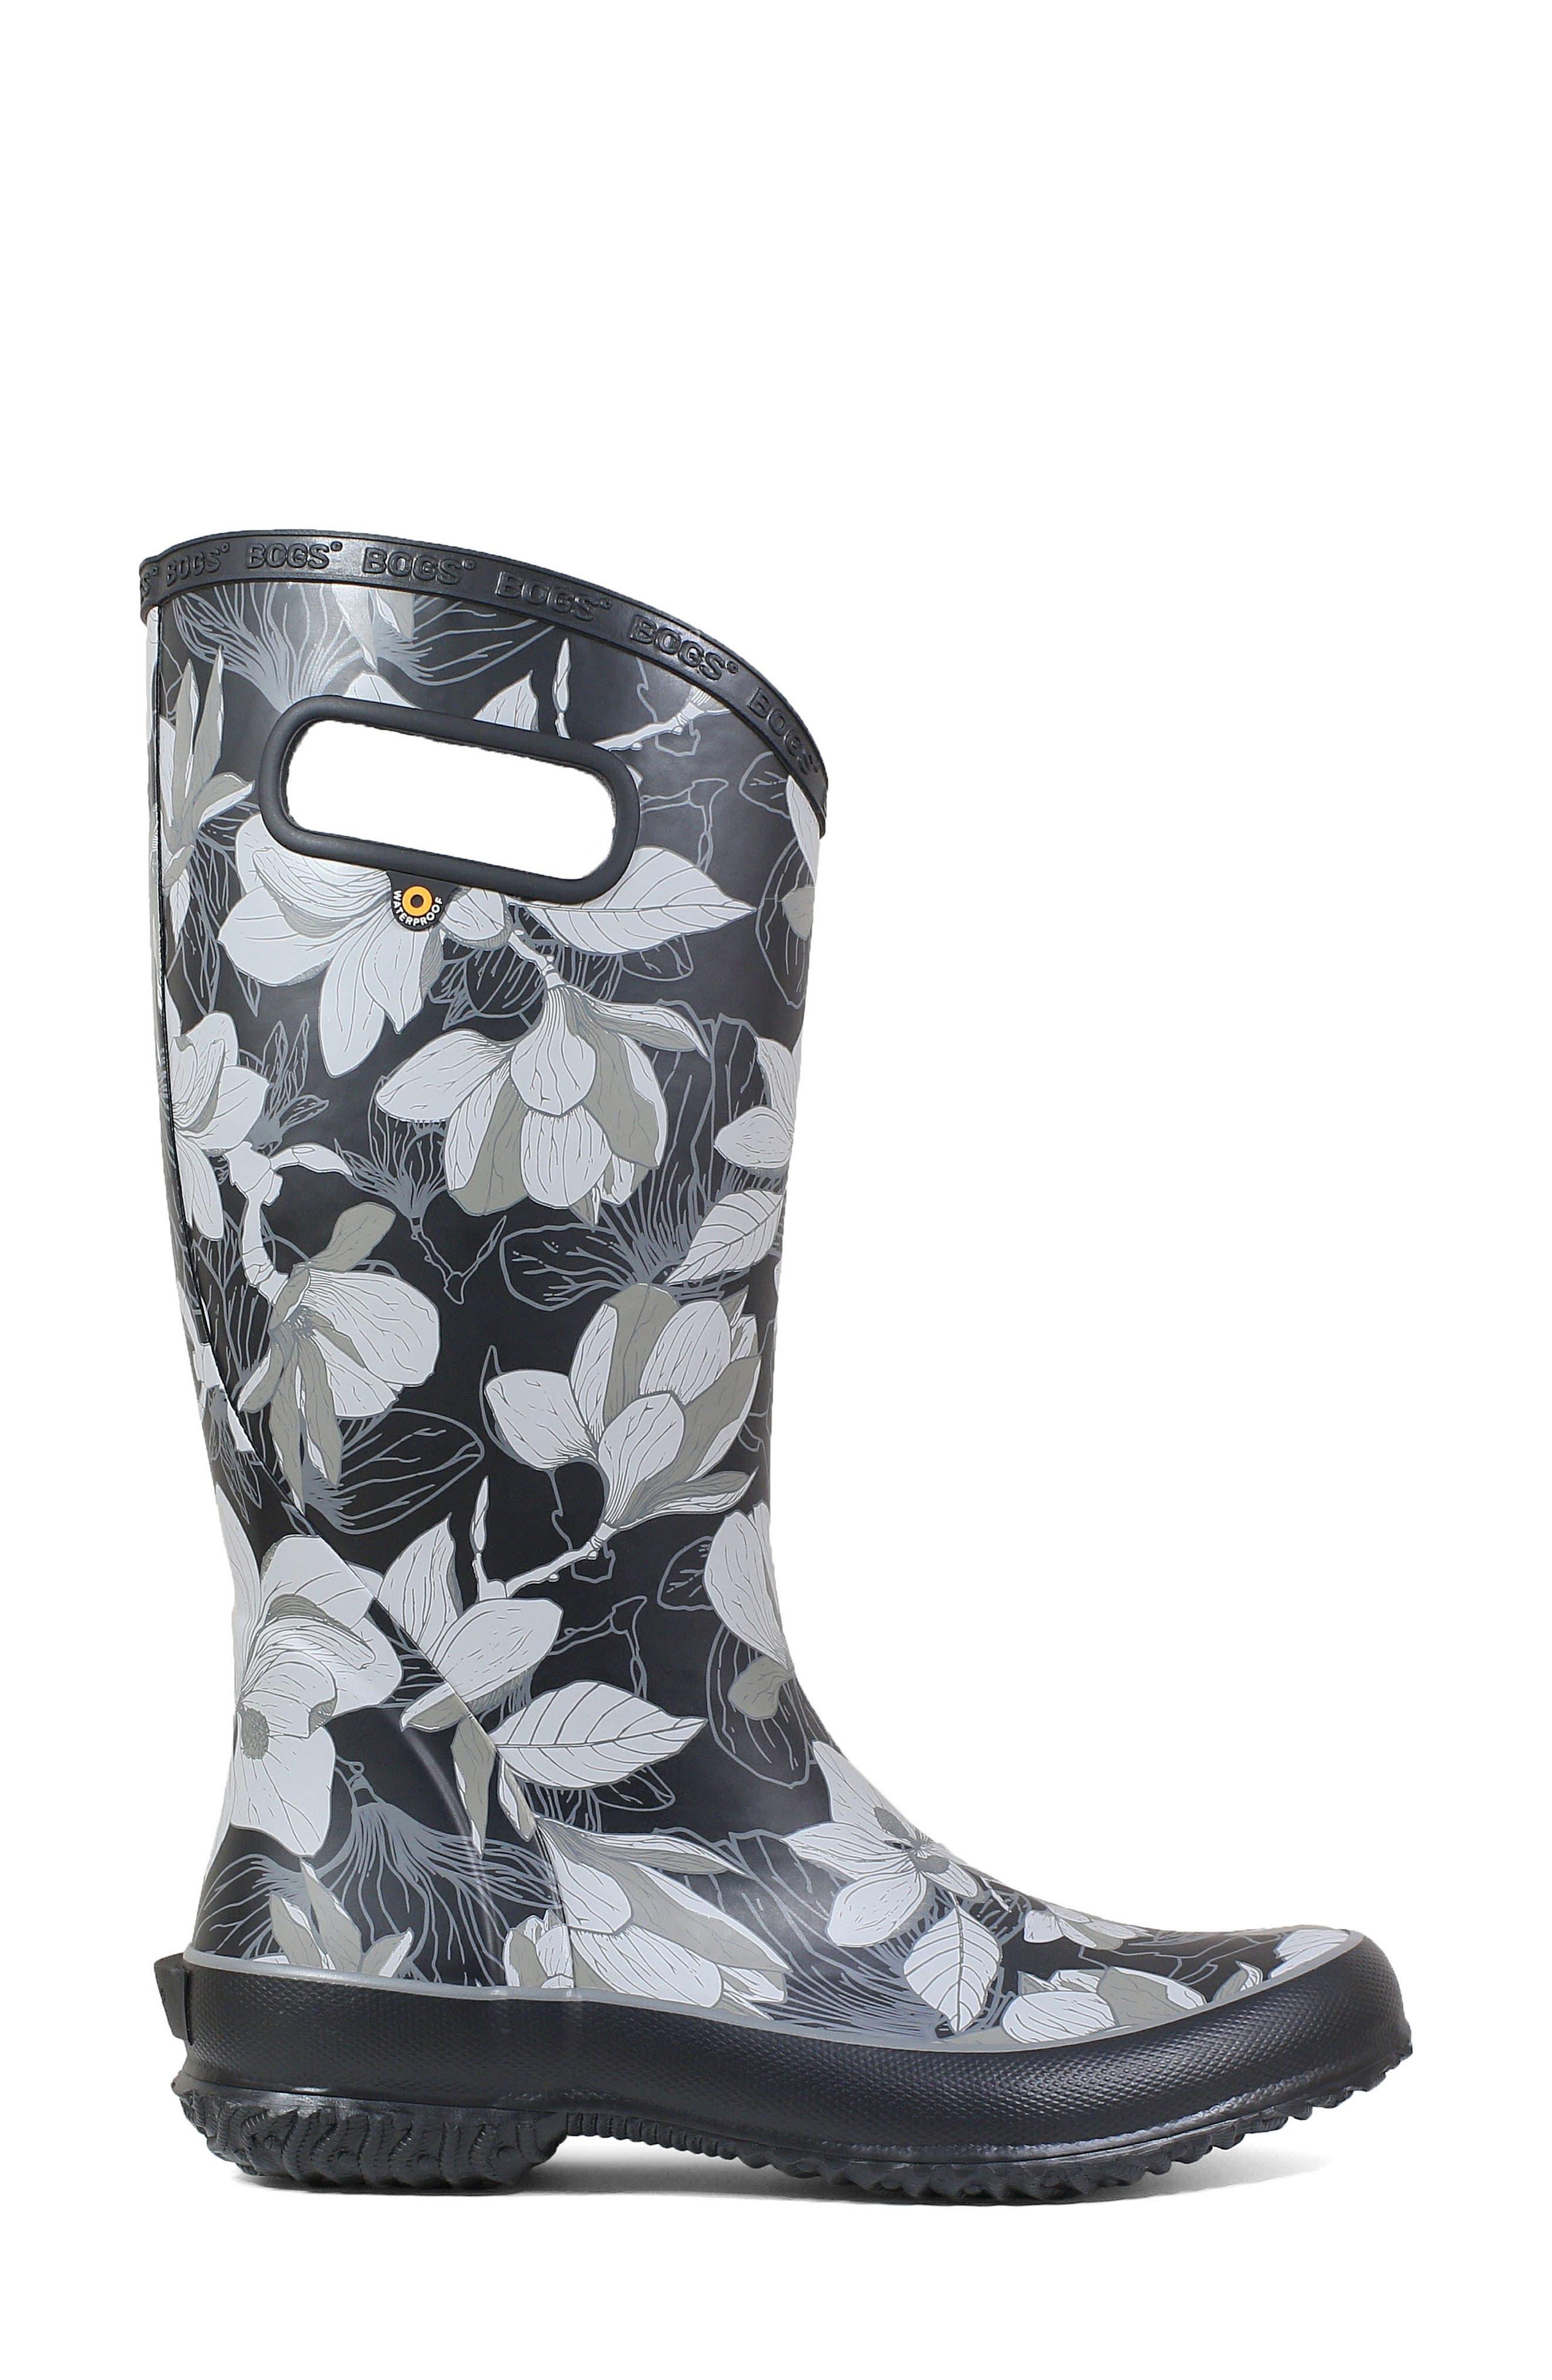 BOGS, Classic Tall Waterproof Rain Boot, Alternate thumbnail 3, color, BLACK MULTI RUBBER